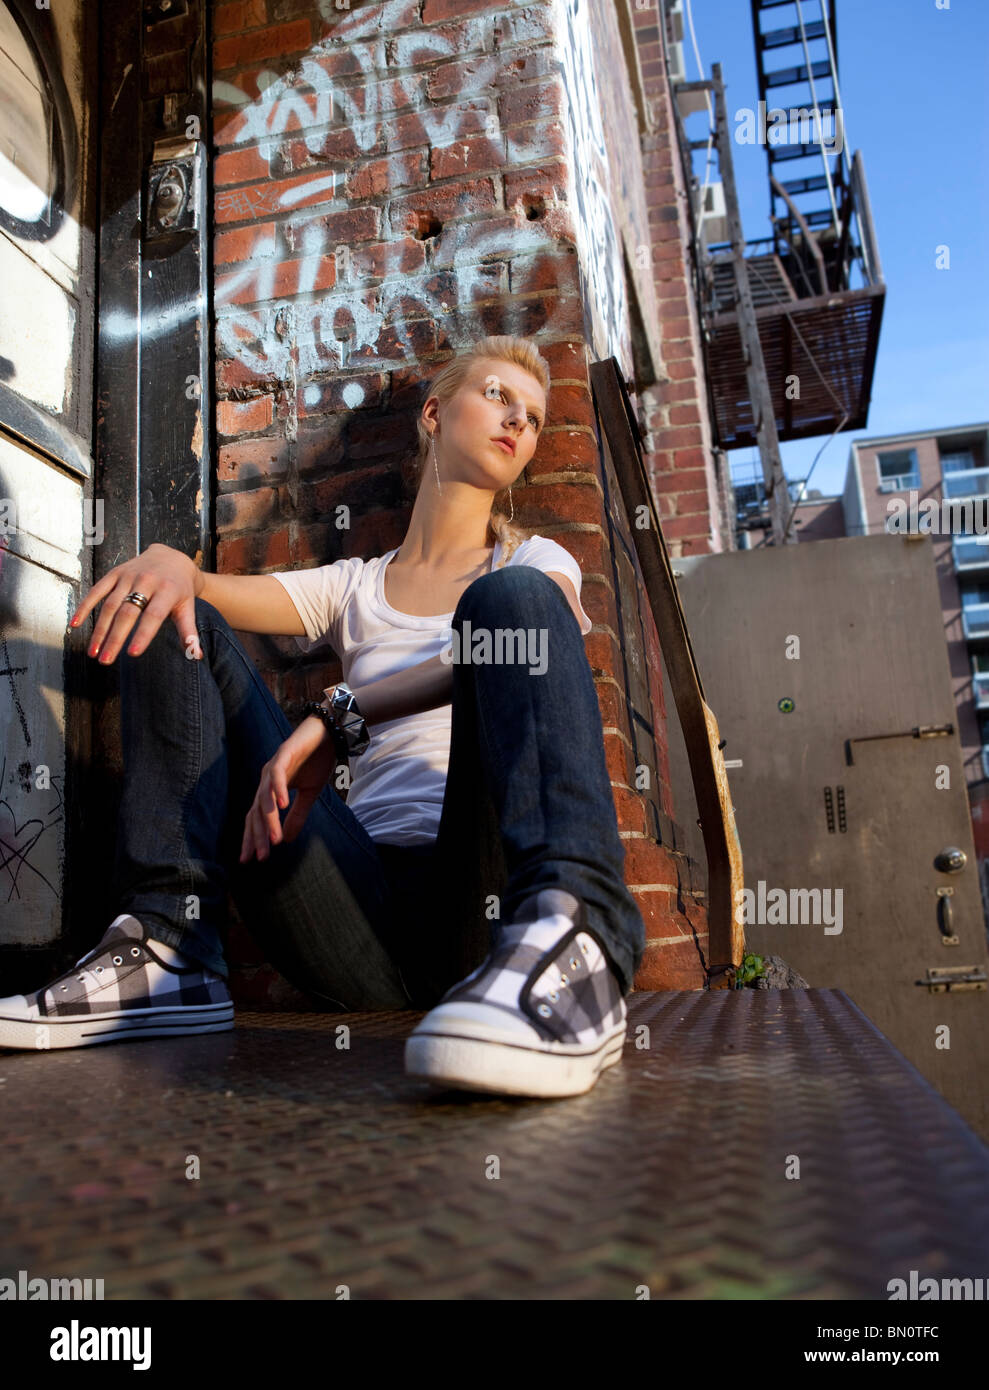 urban portrait - Stock Image